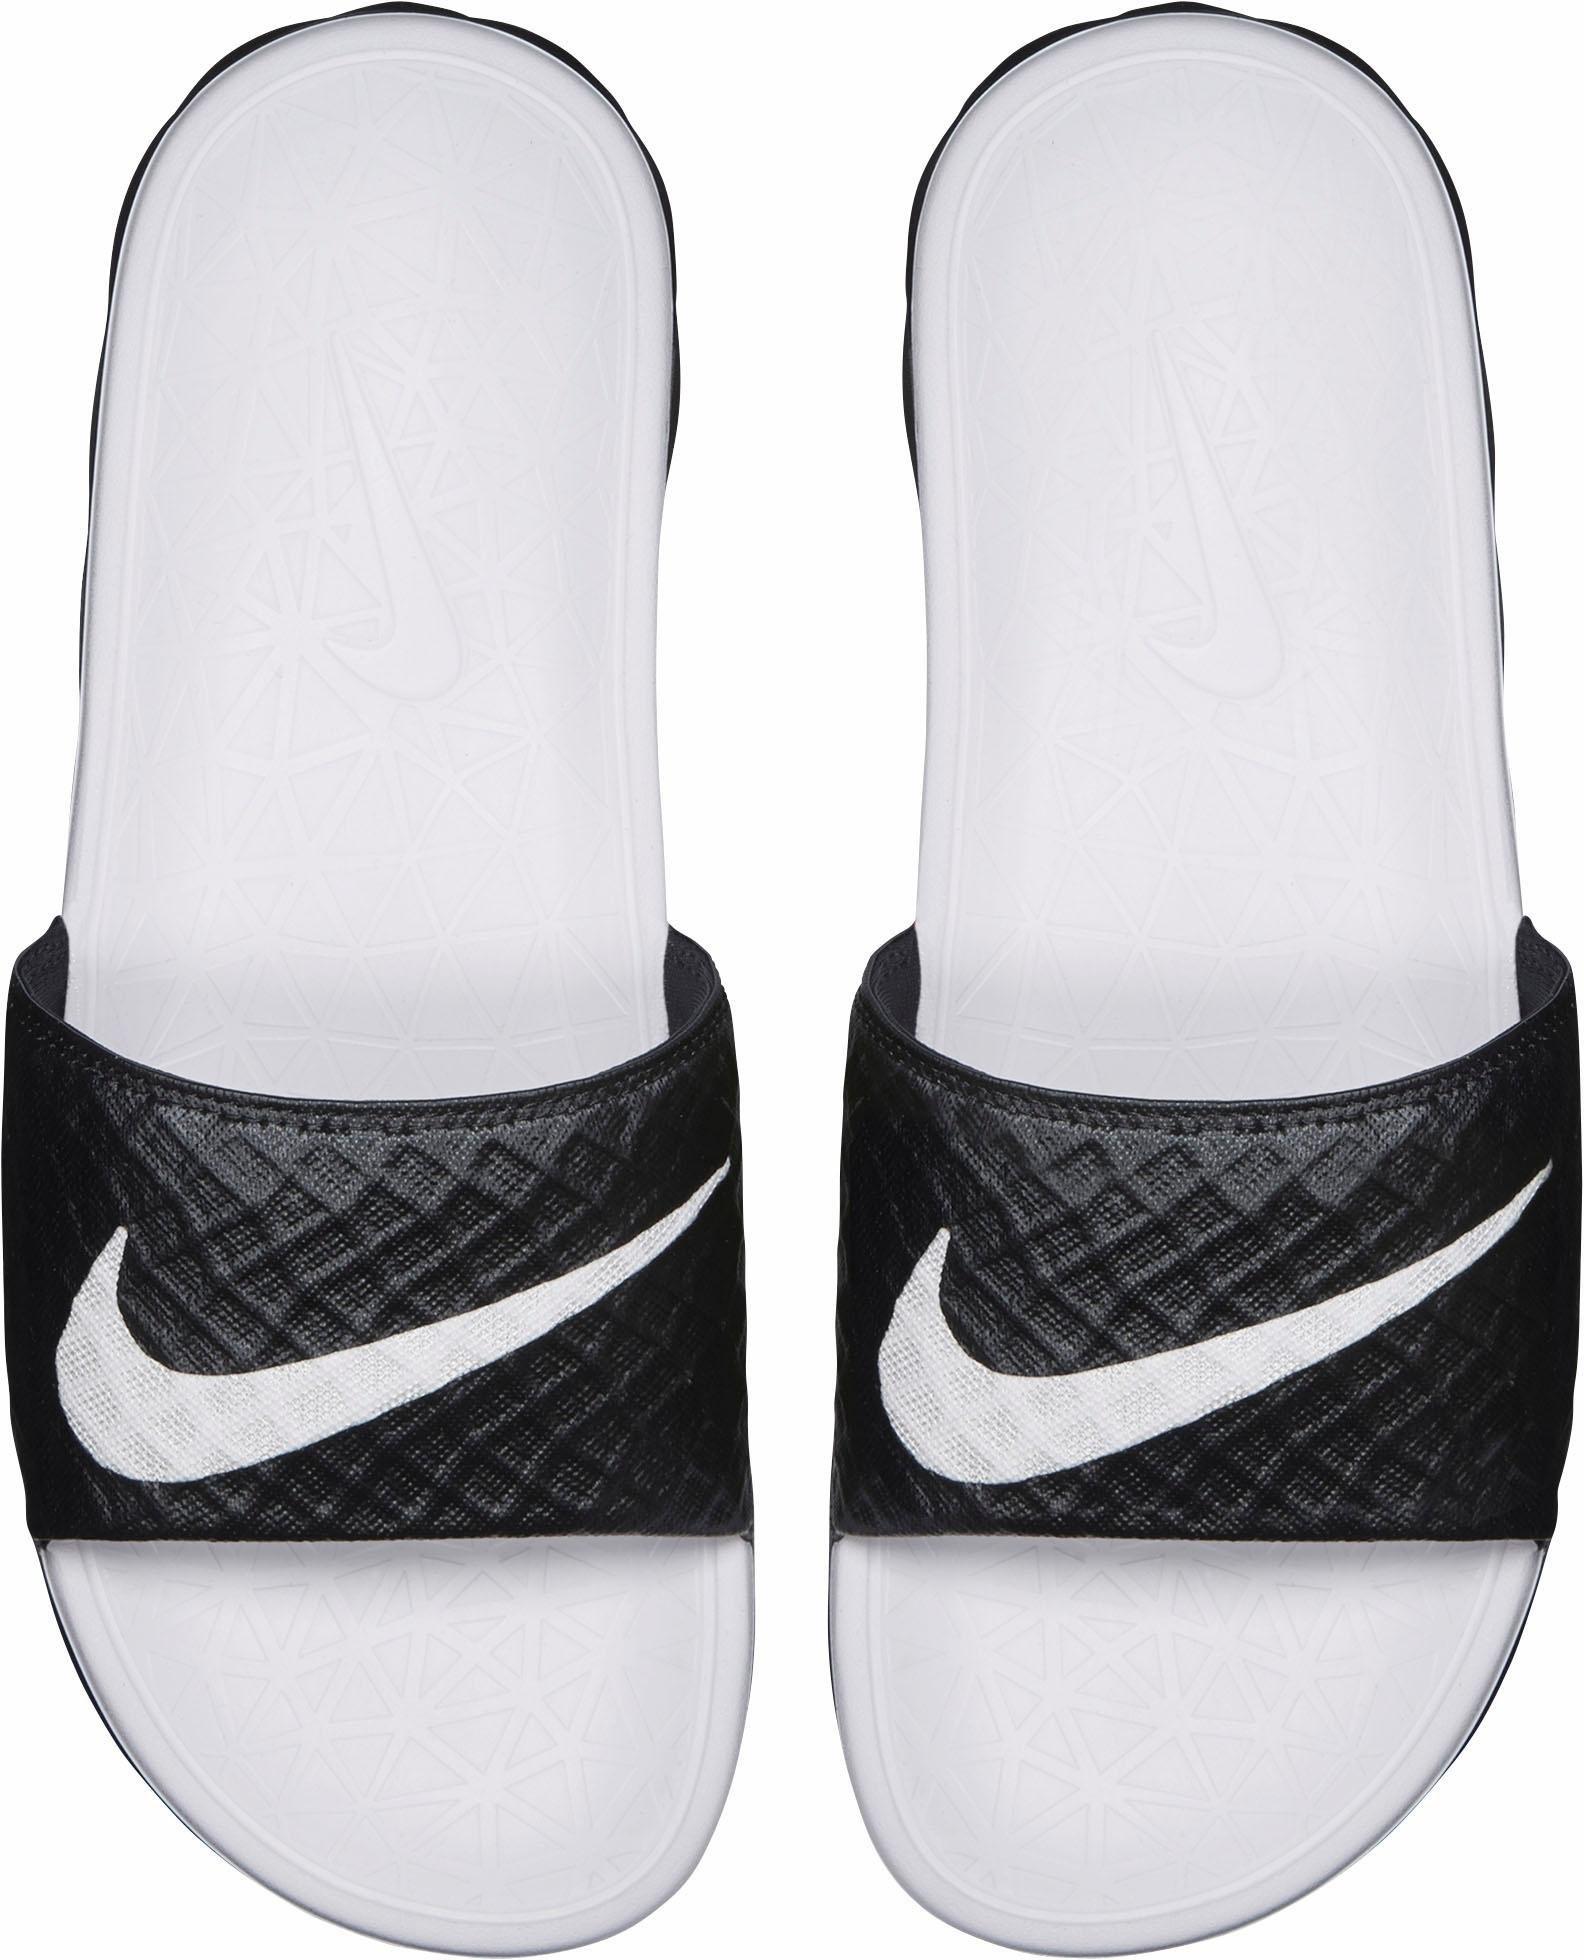 728e6358116 Afbeeldingsbron: Nike Sportswear badslippers »Wmns Benassi Solarsoft Slide«